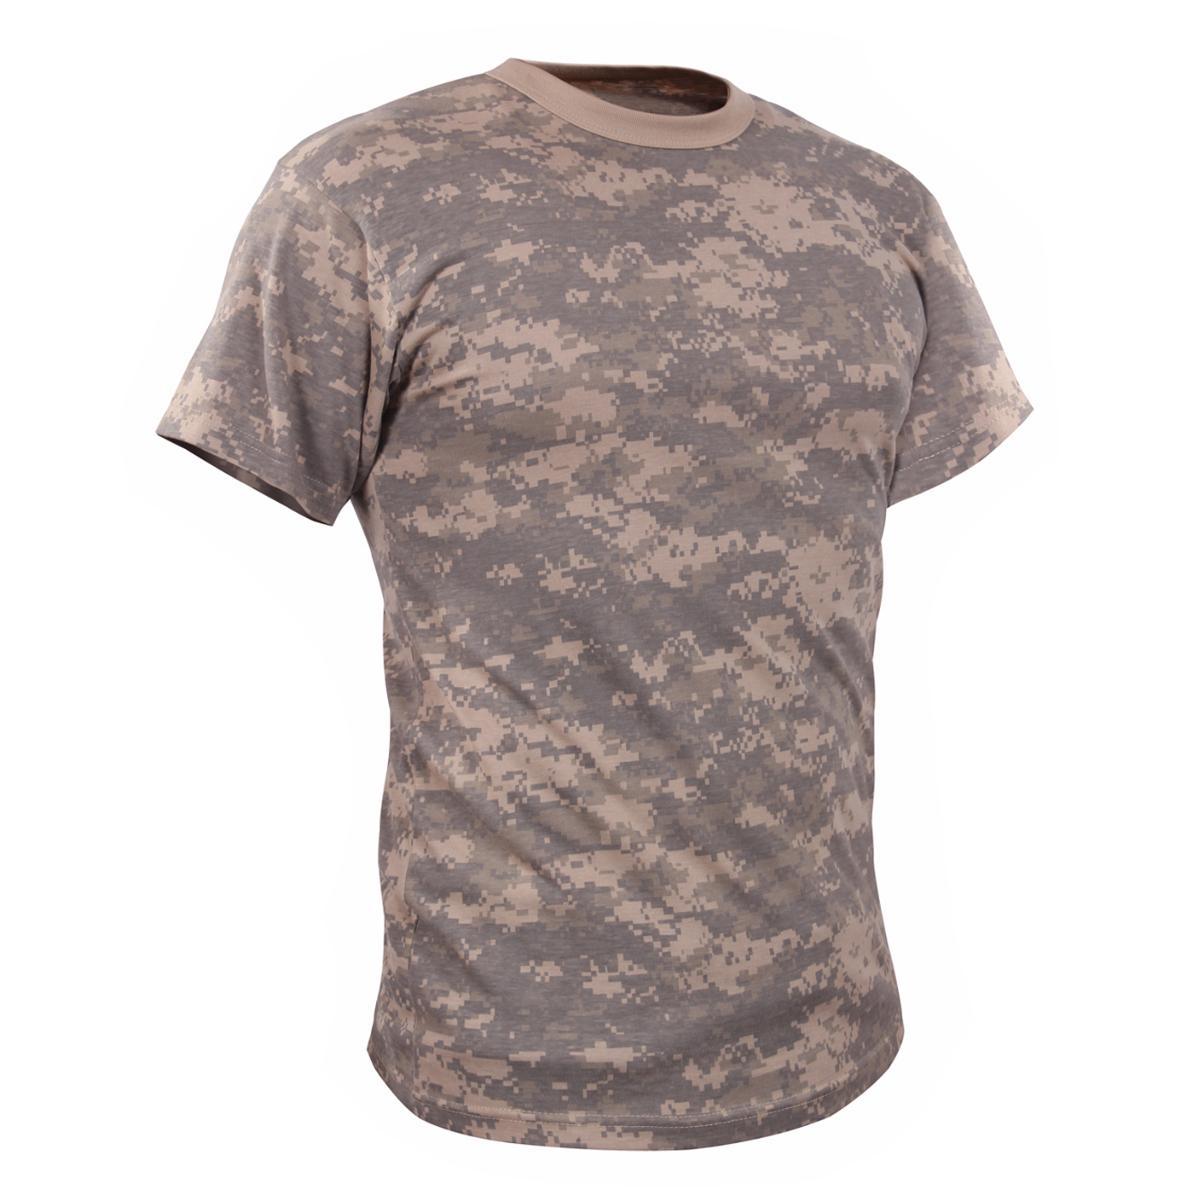 Vintage Styled Camouflage T-shirt, ACU Digital Camo